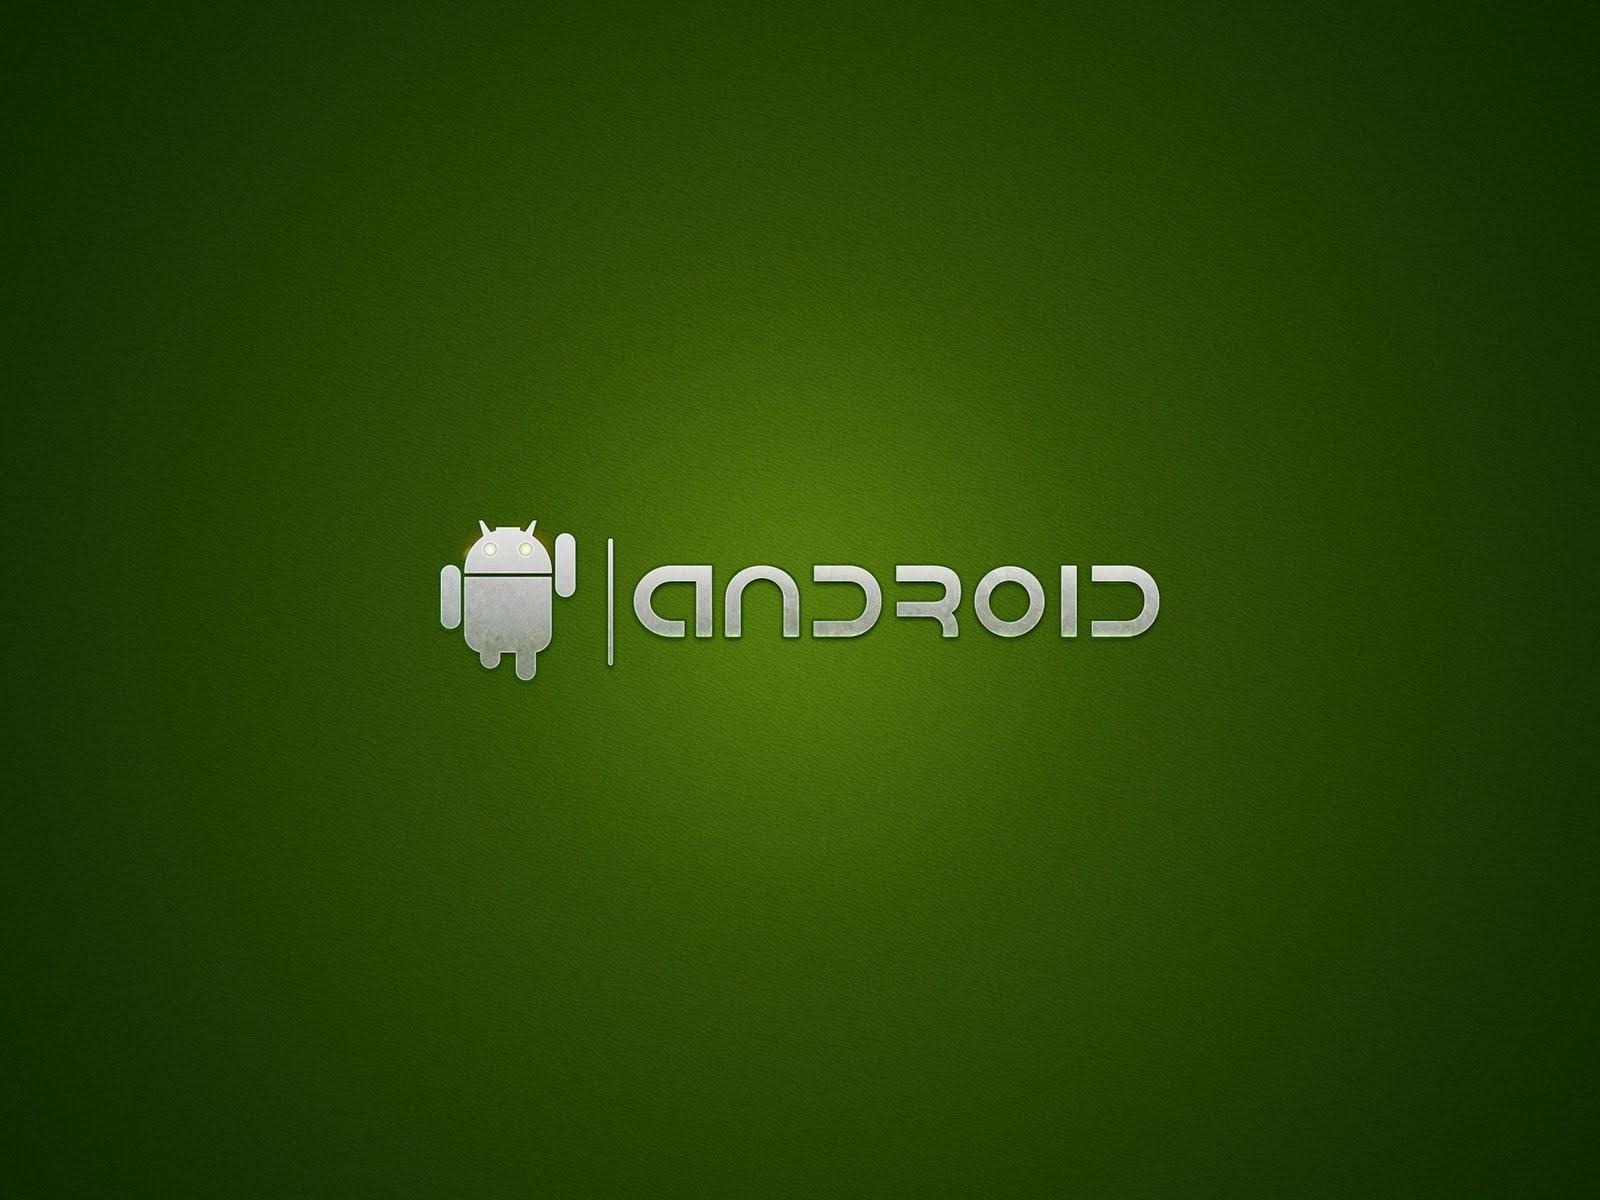 Wallpaper Android Gelap Latar Belakang Warna